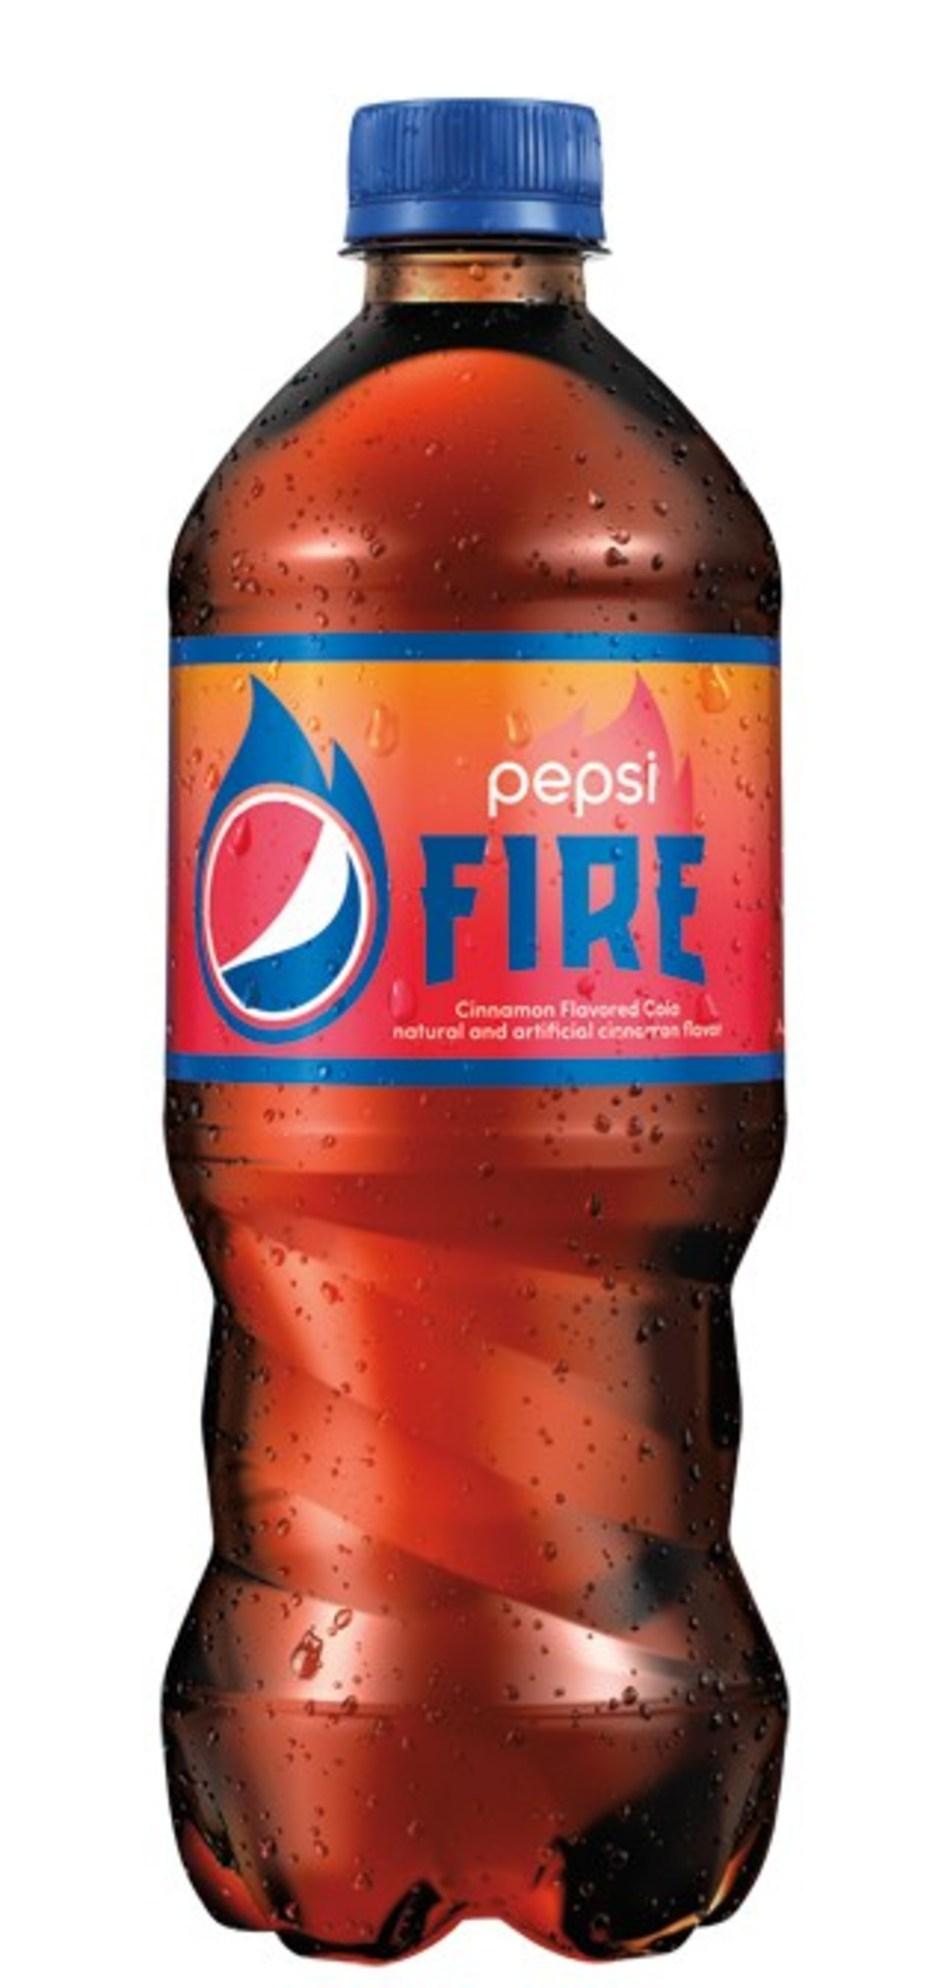 Pepsi launches limited-edition cinnamon flavored cola, Pepsi Fire.